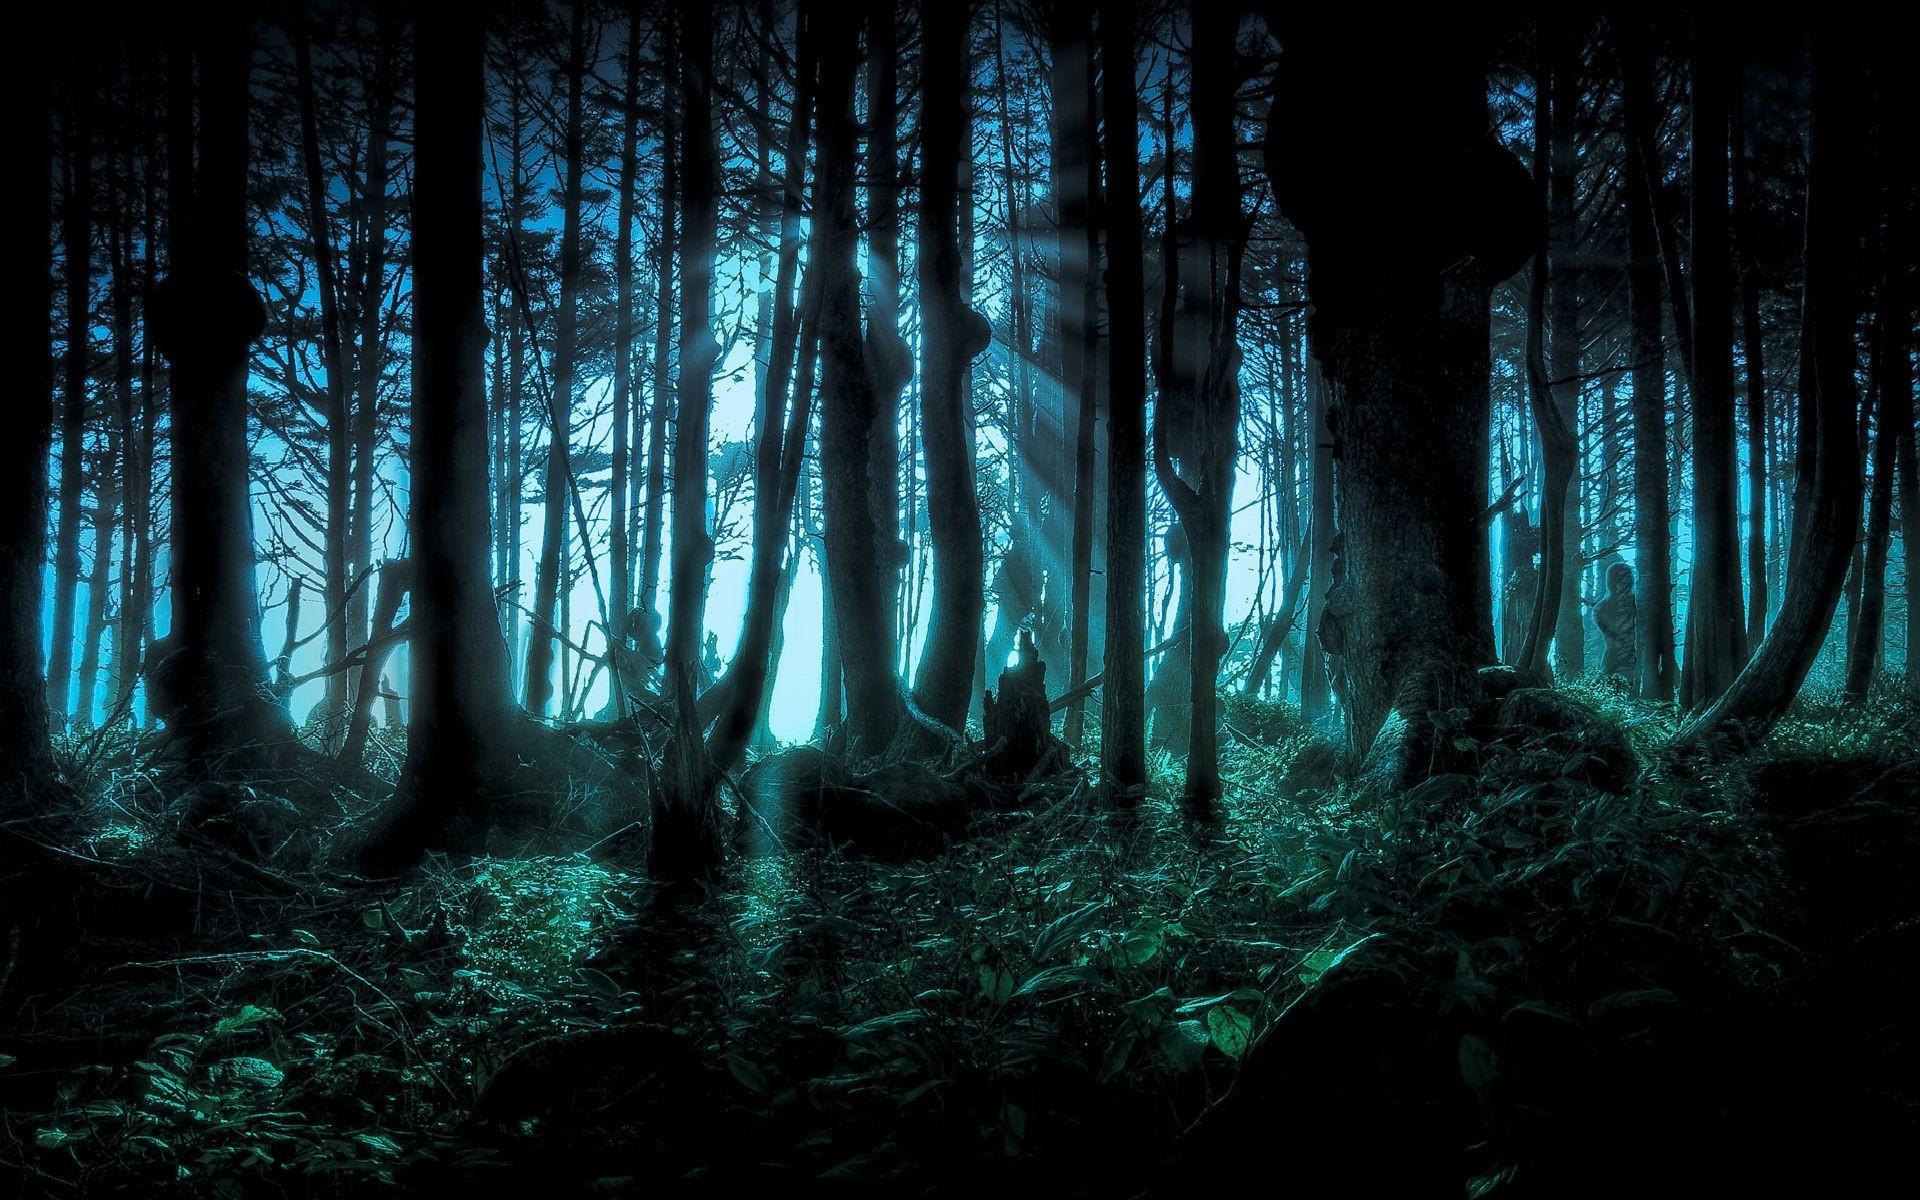 Cool dark background 53 images - Nature wallpaper dark ...